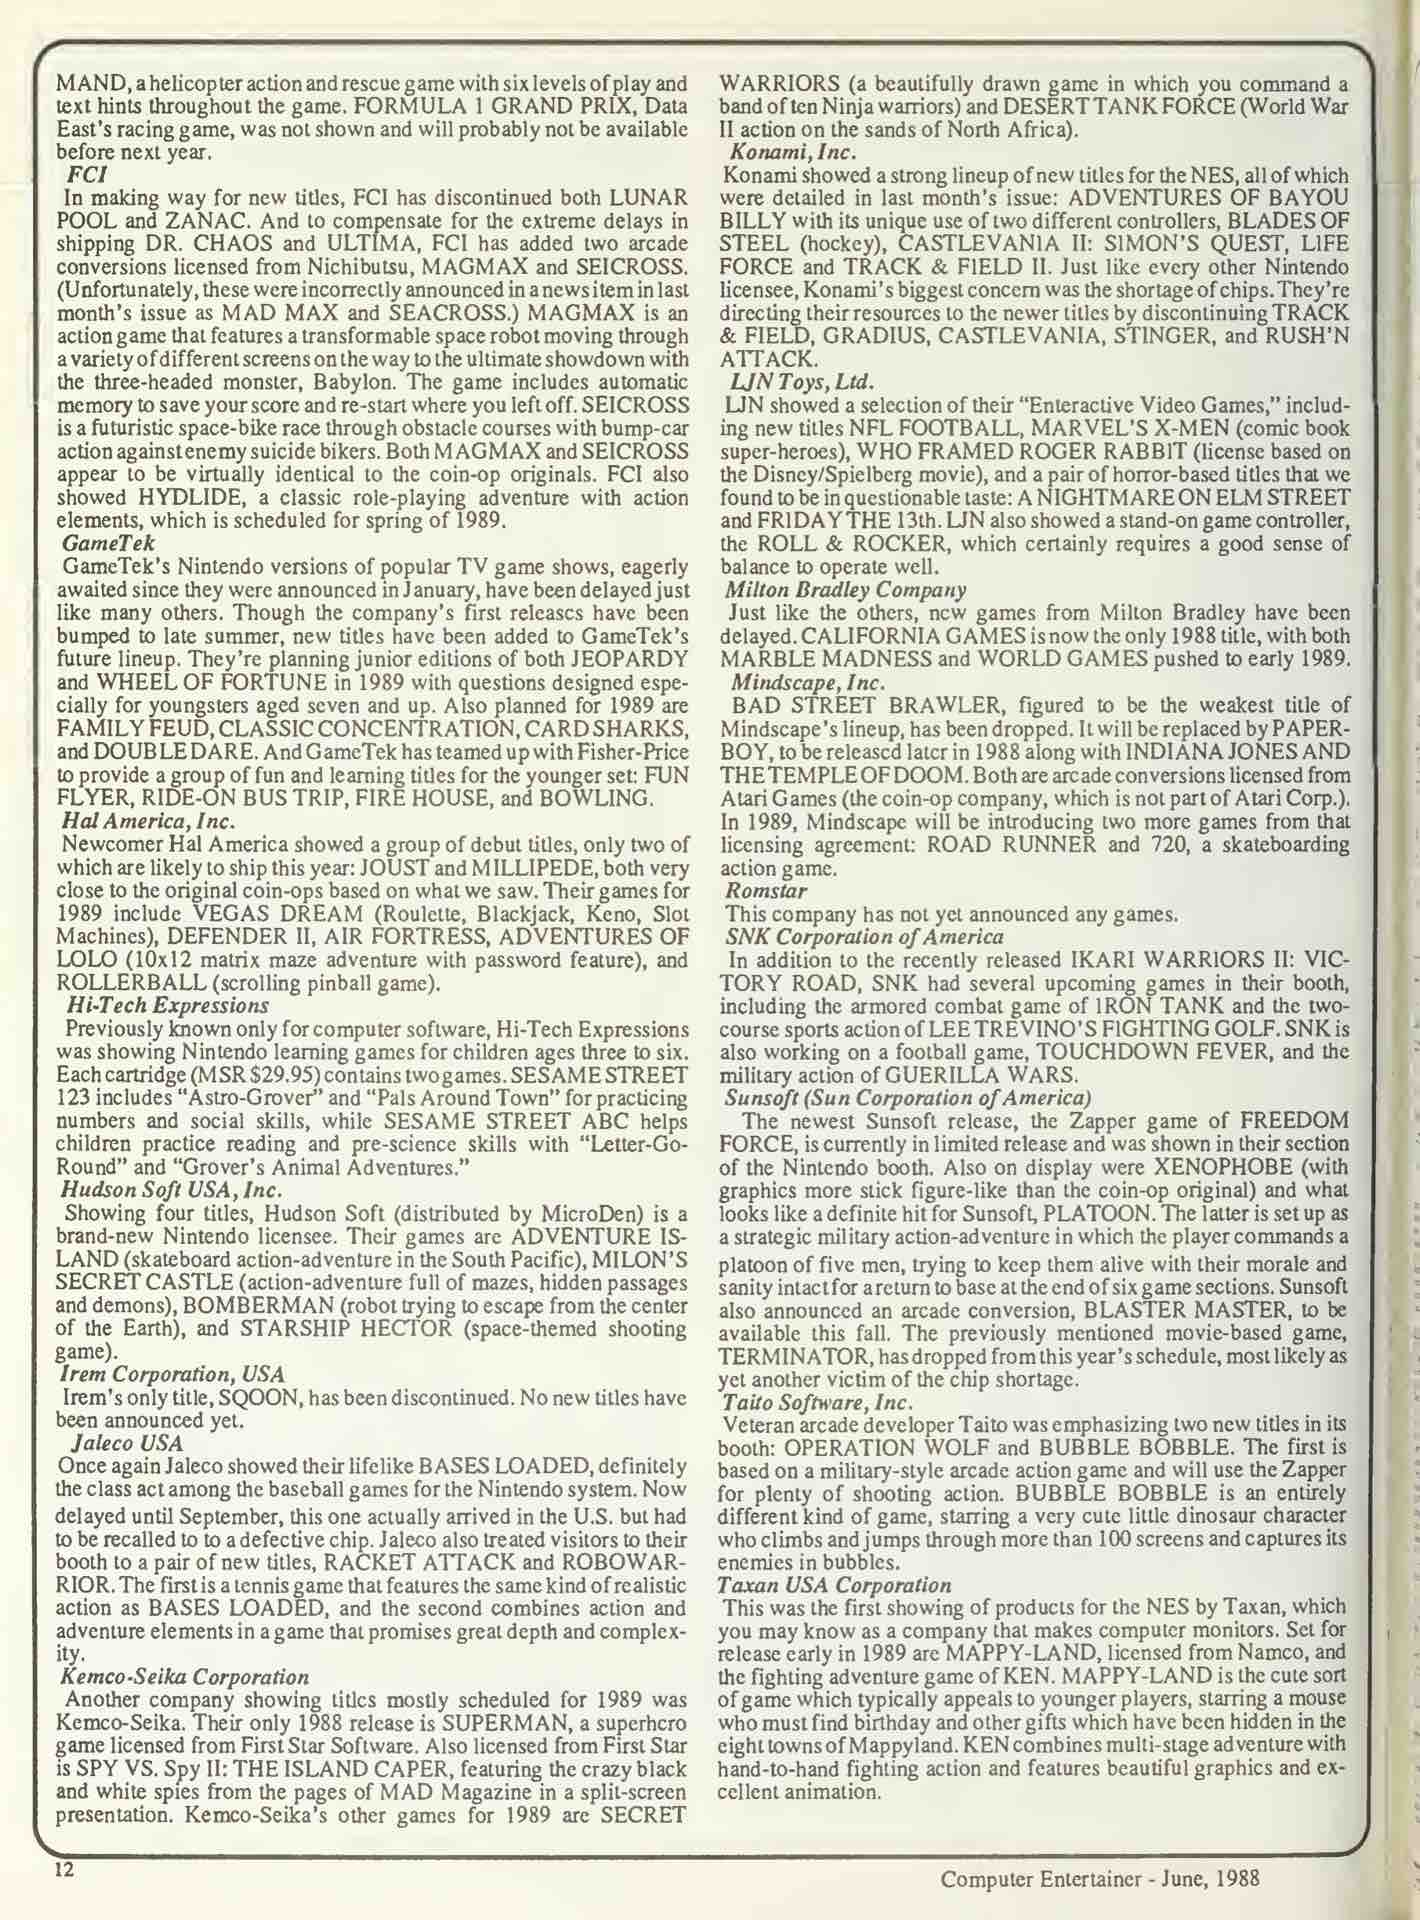 Computer Entertainer - June 1988 - pg 12